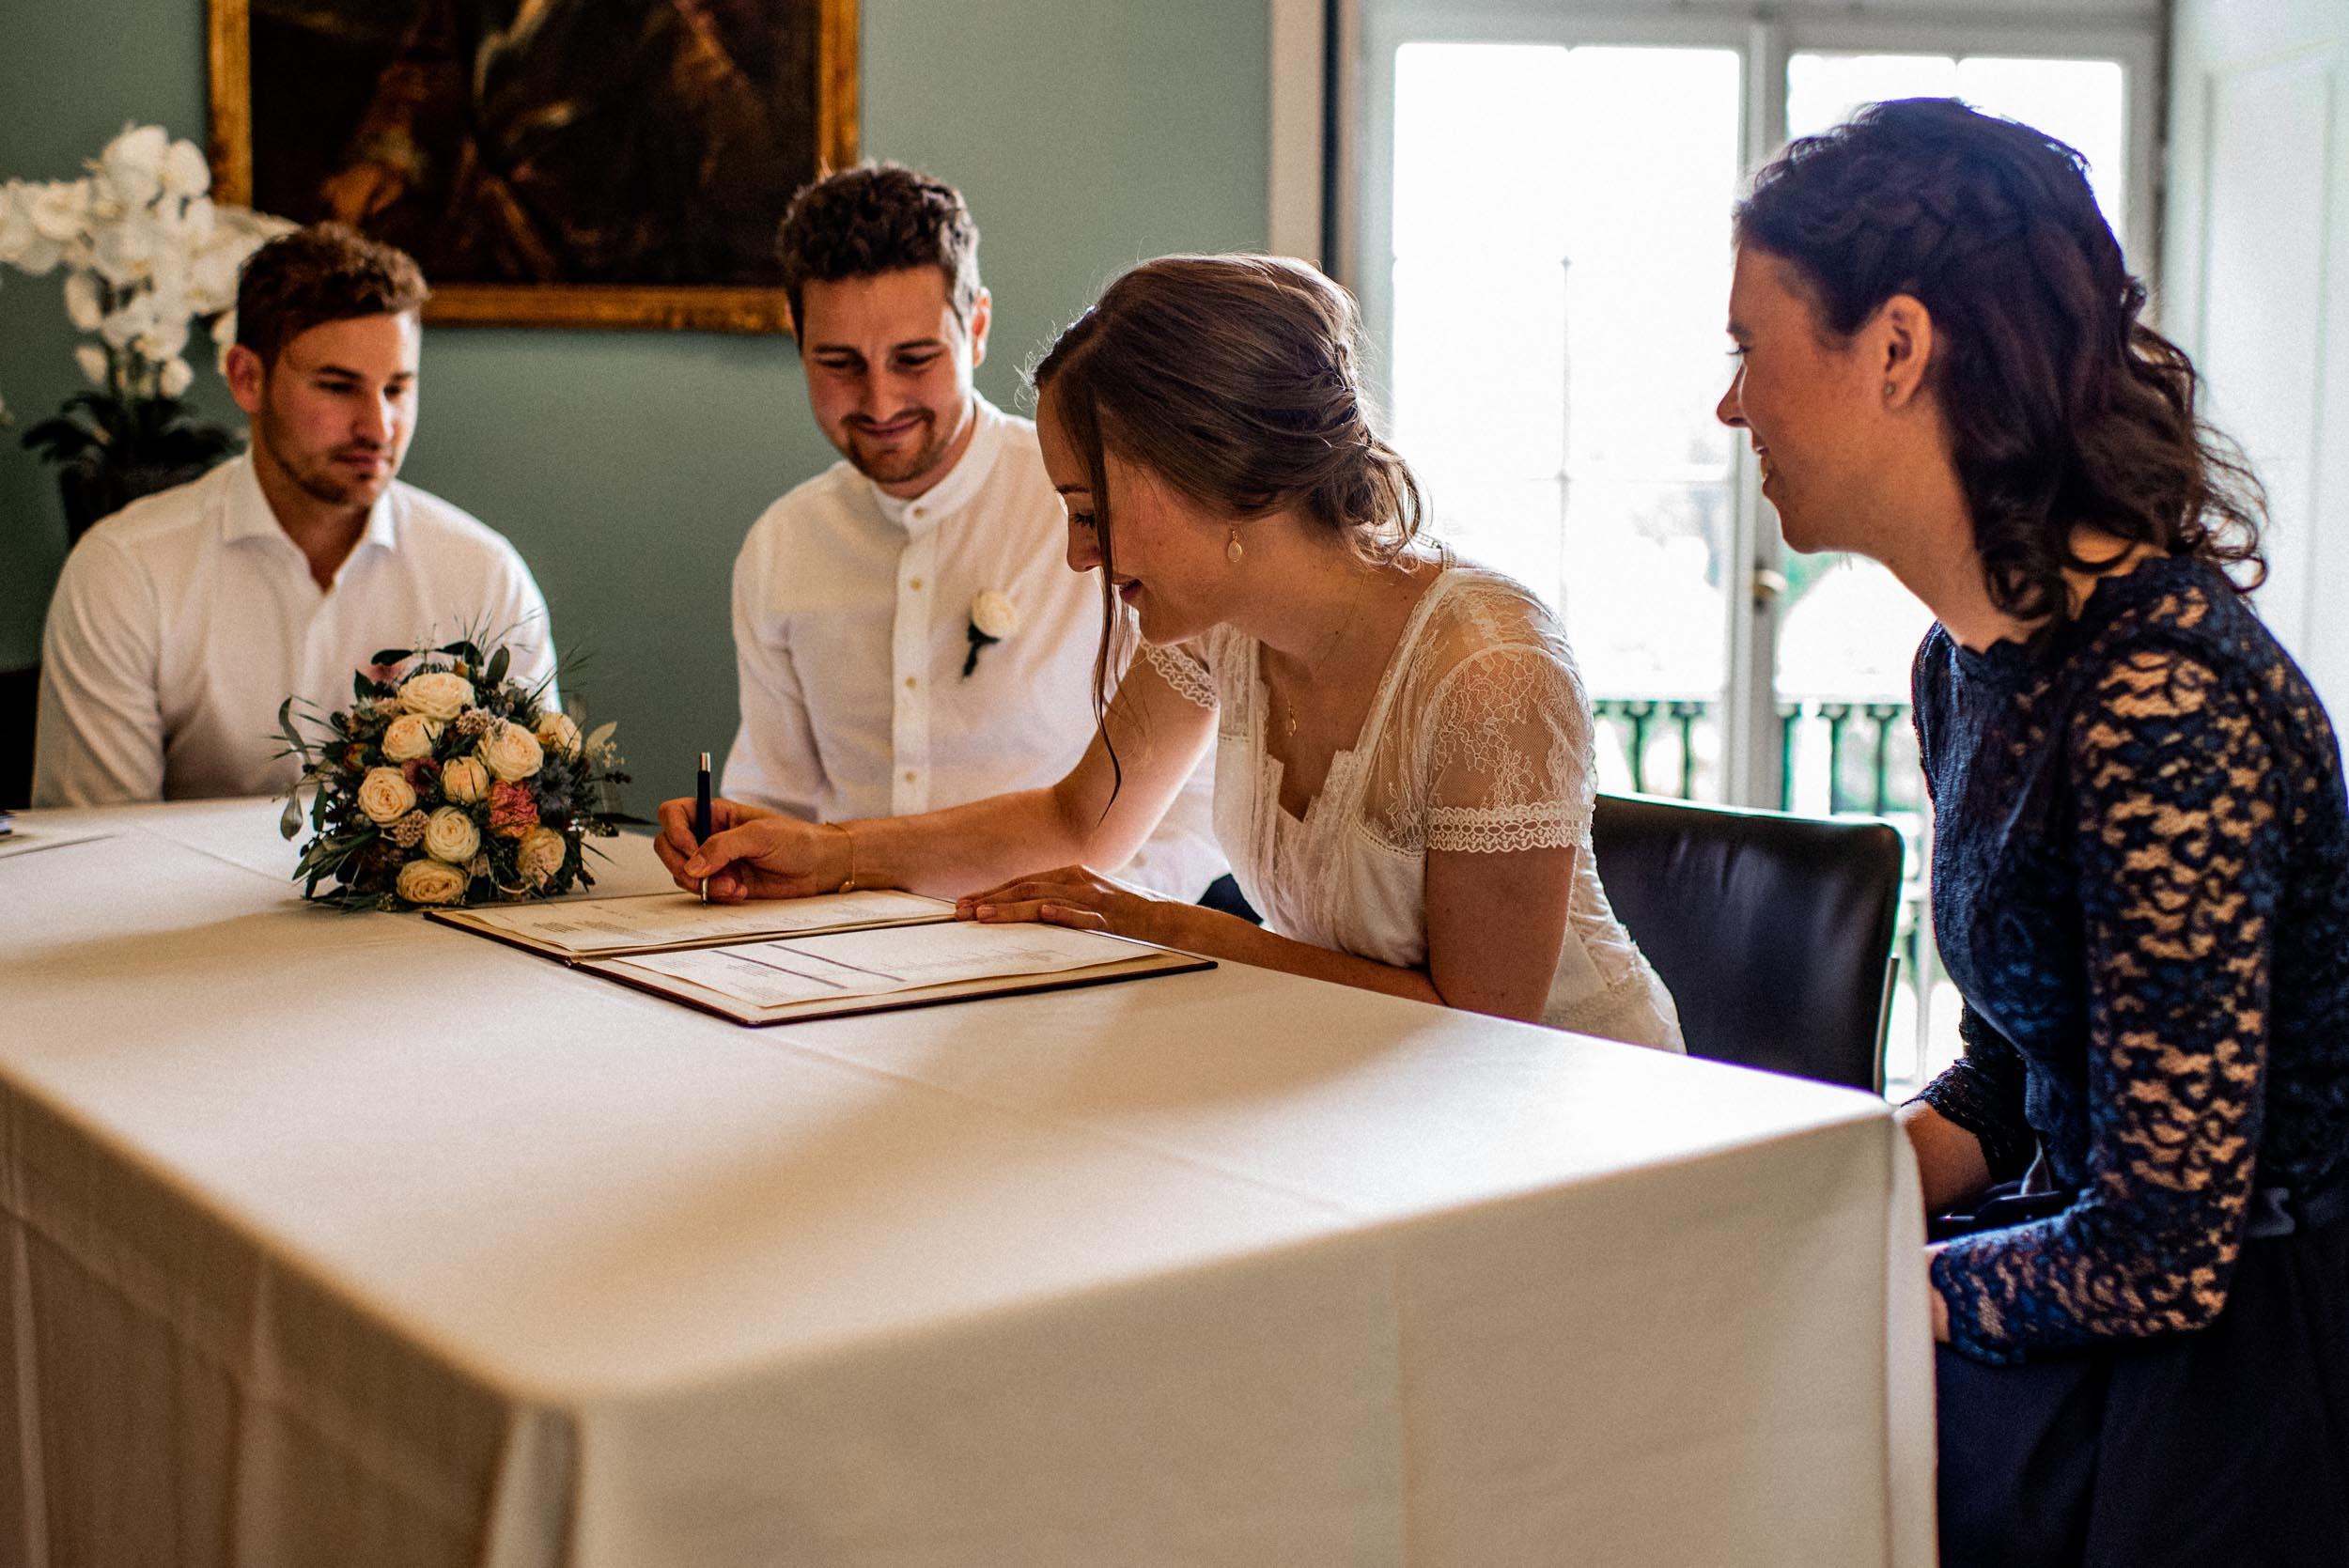 Hochzeitsreportage-Baden-Aargau_2019_15.jpg